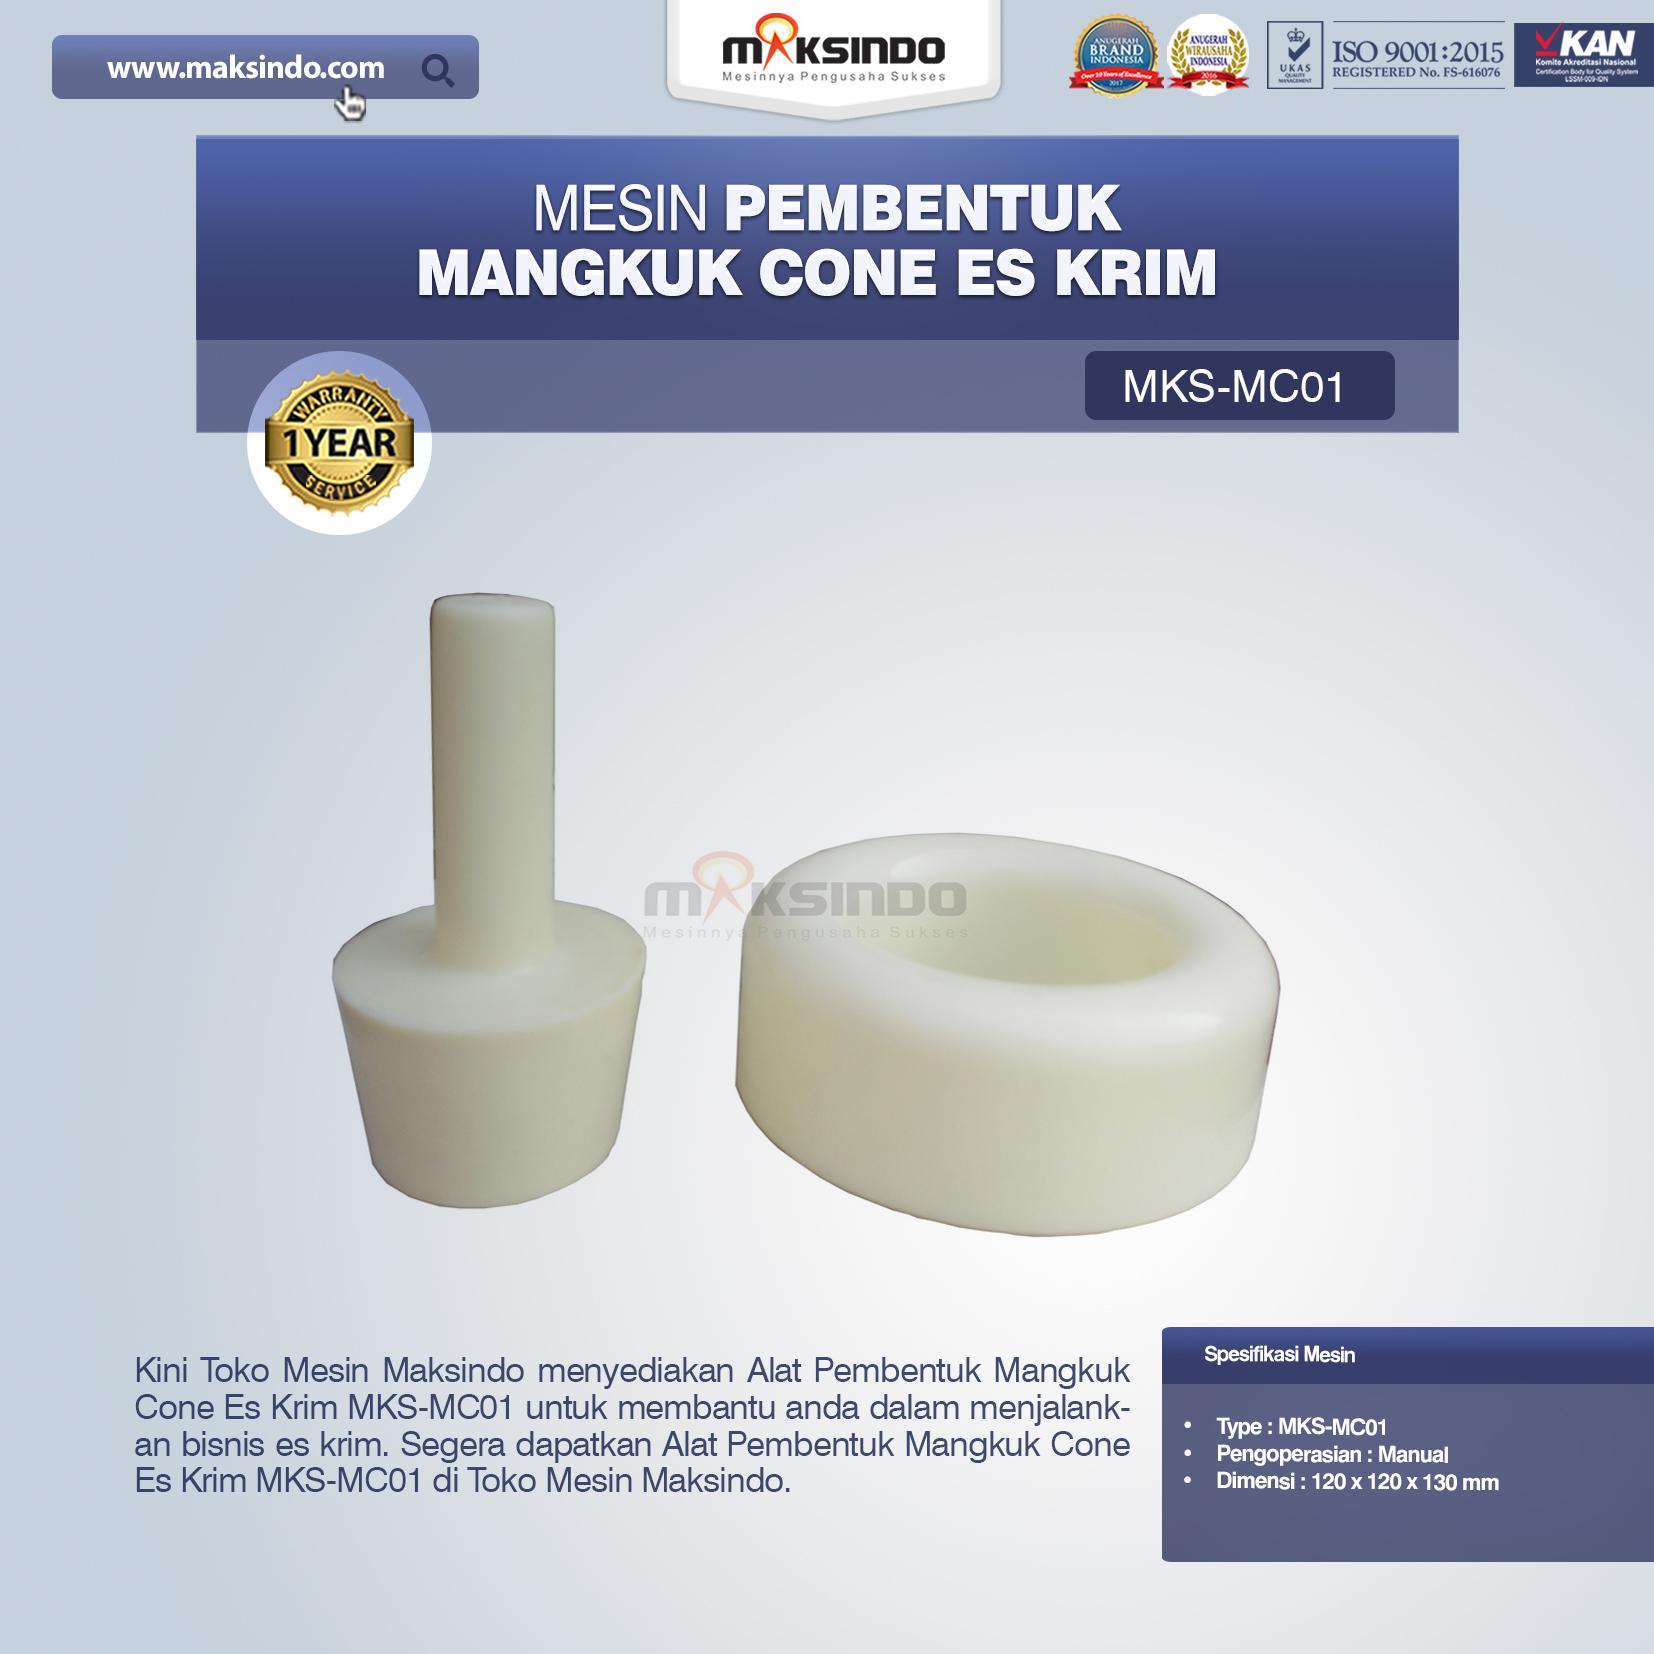 Jual Alat Pembentuk Mangkuk Cone Es Krim MKS-MC01 di Bekasi